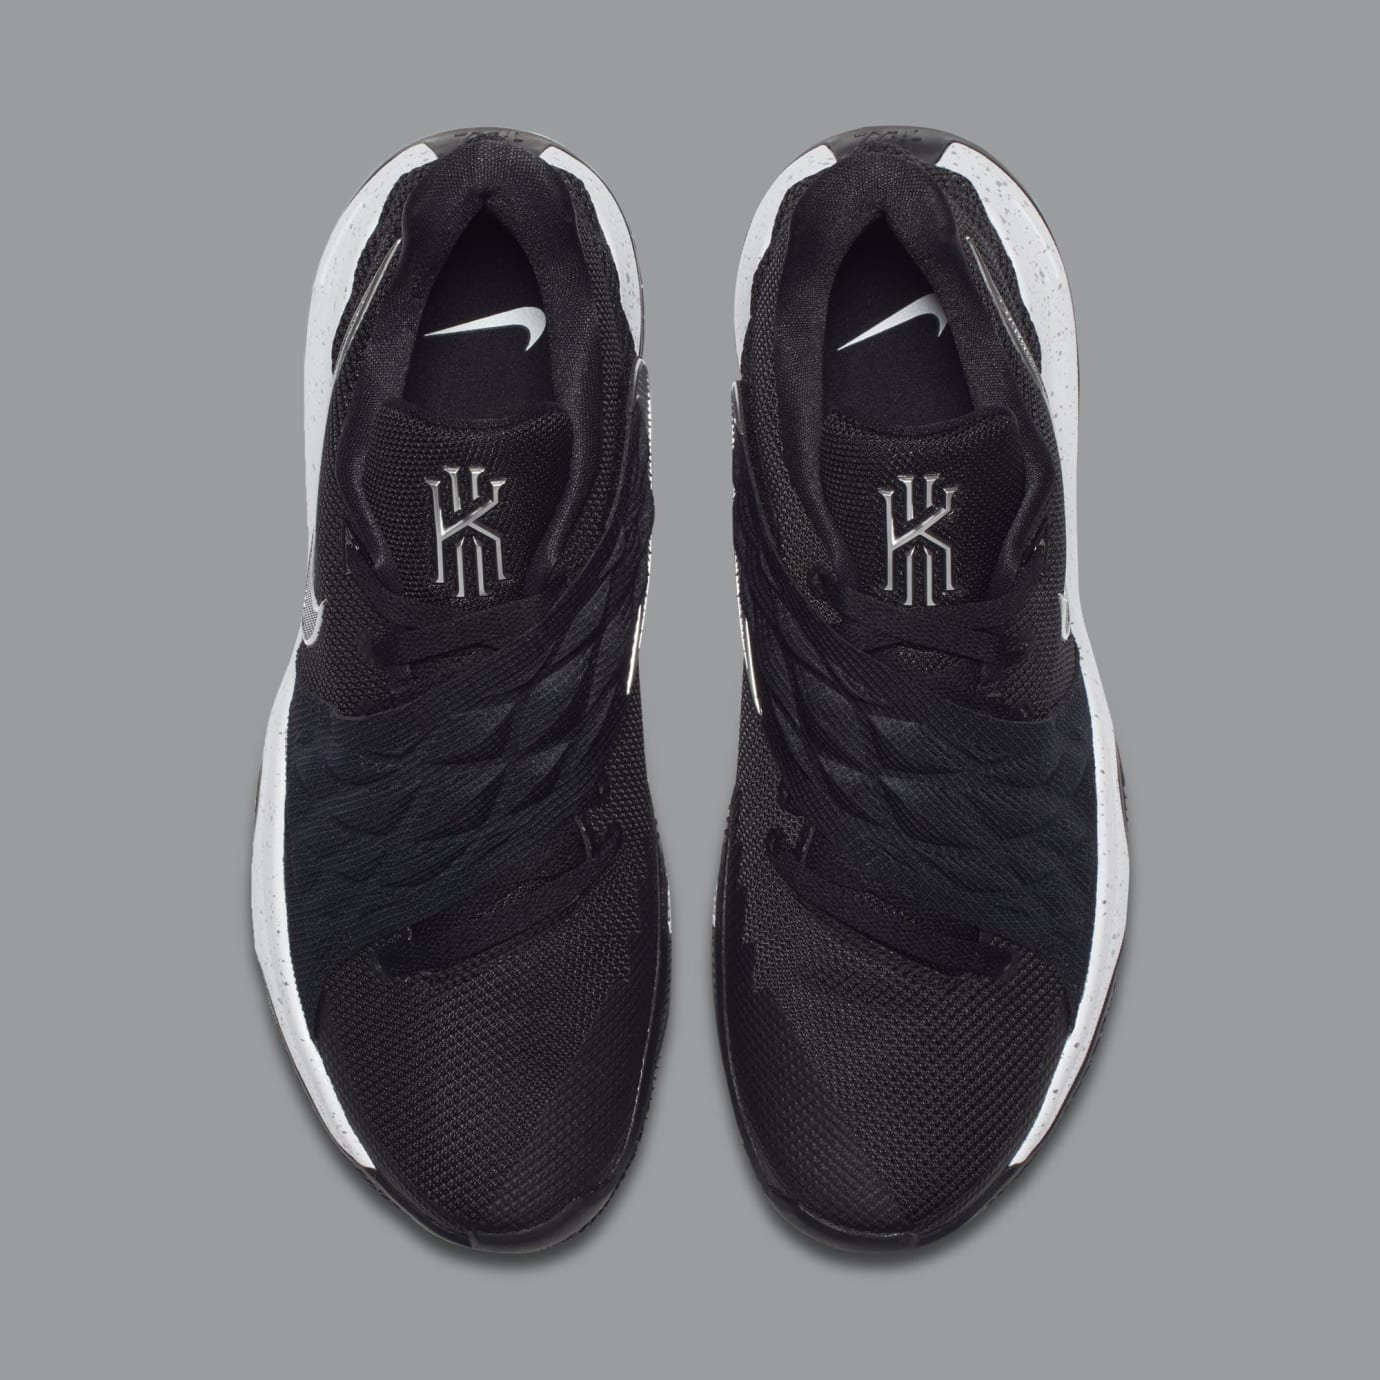 9c118bd5021e Image via Nike Nike Kyrie 4 Low  Black Metallic Silver  AO8979-003 (Top)